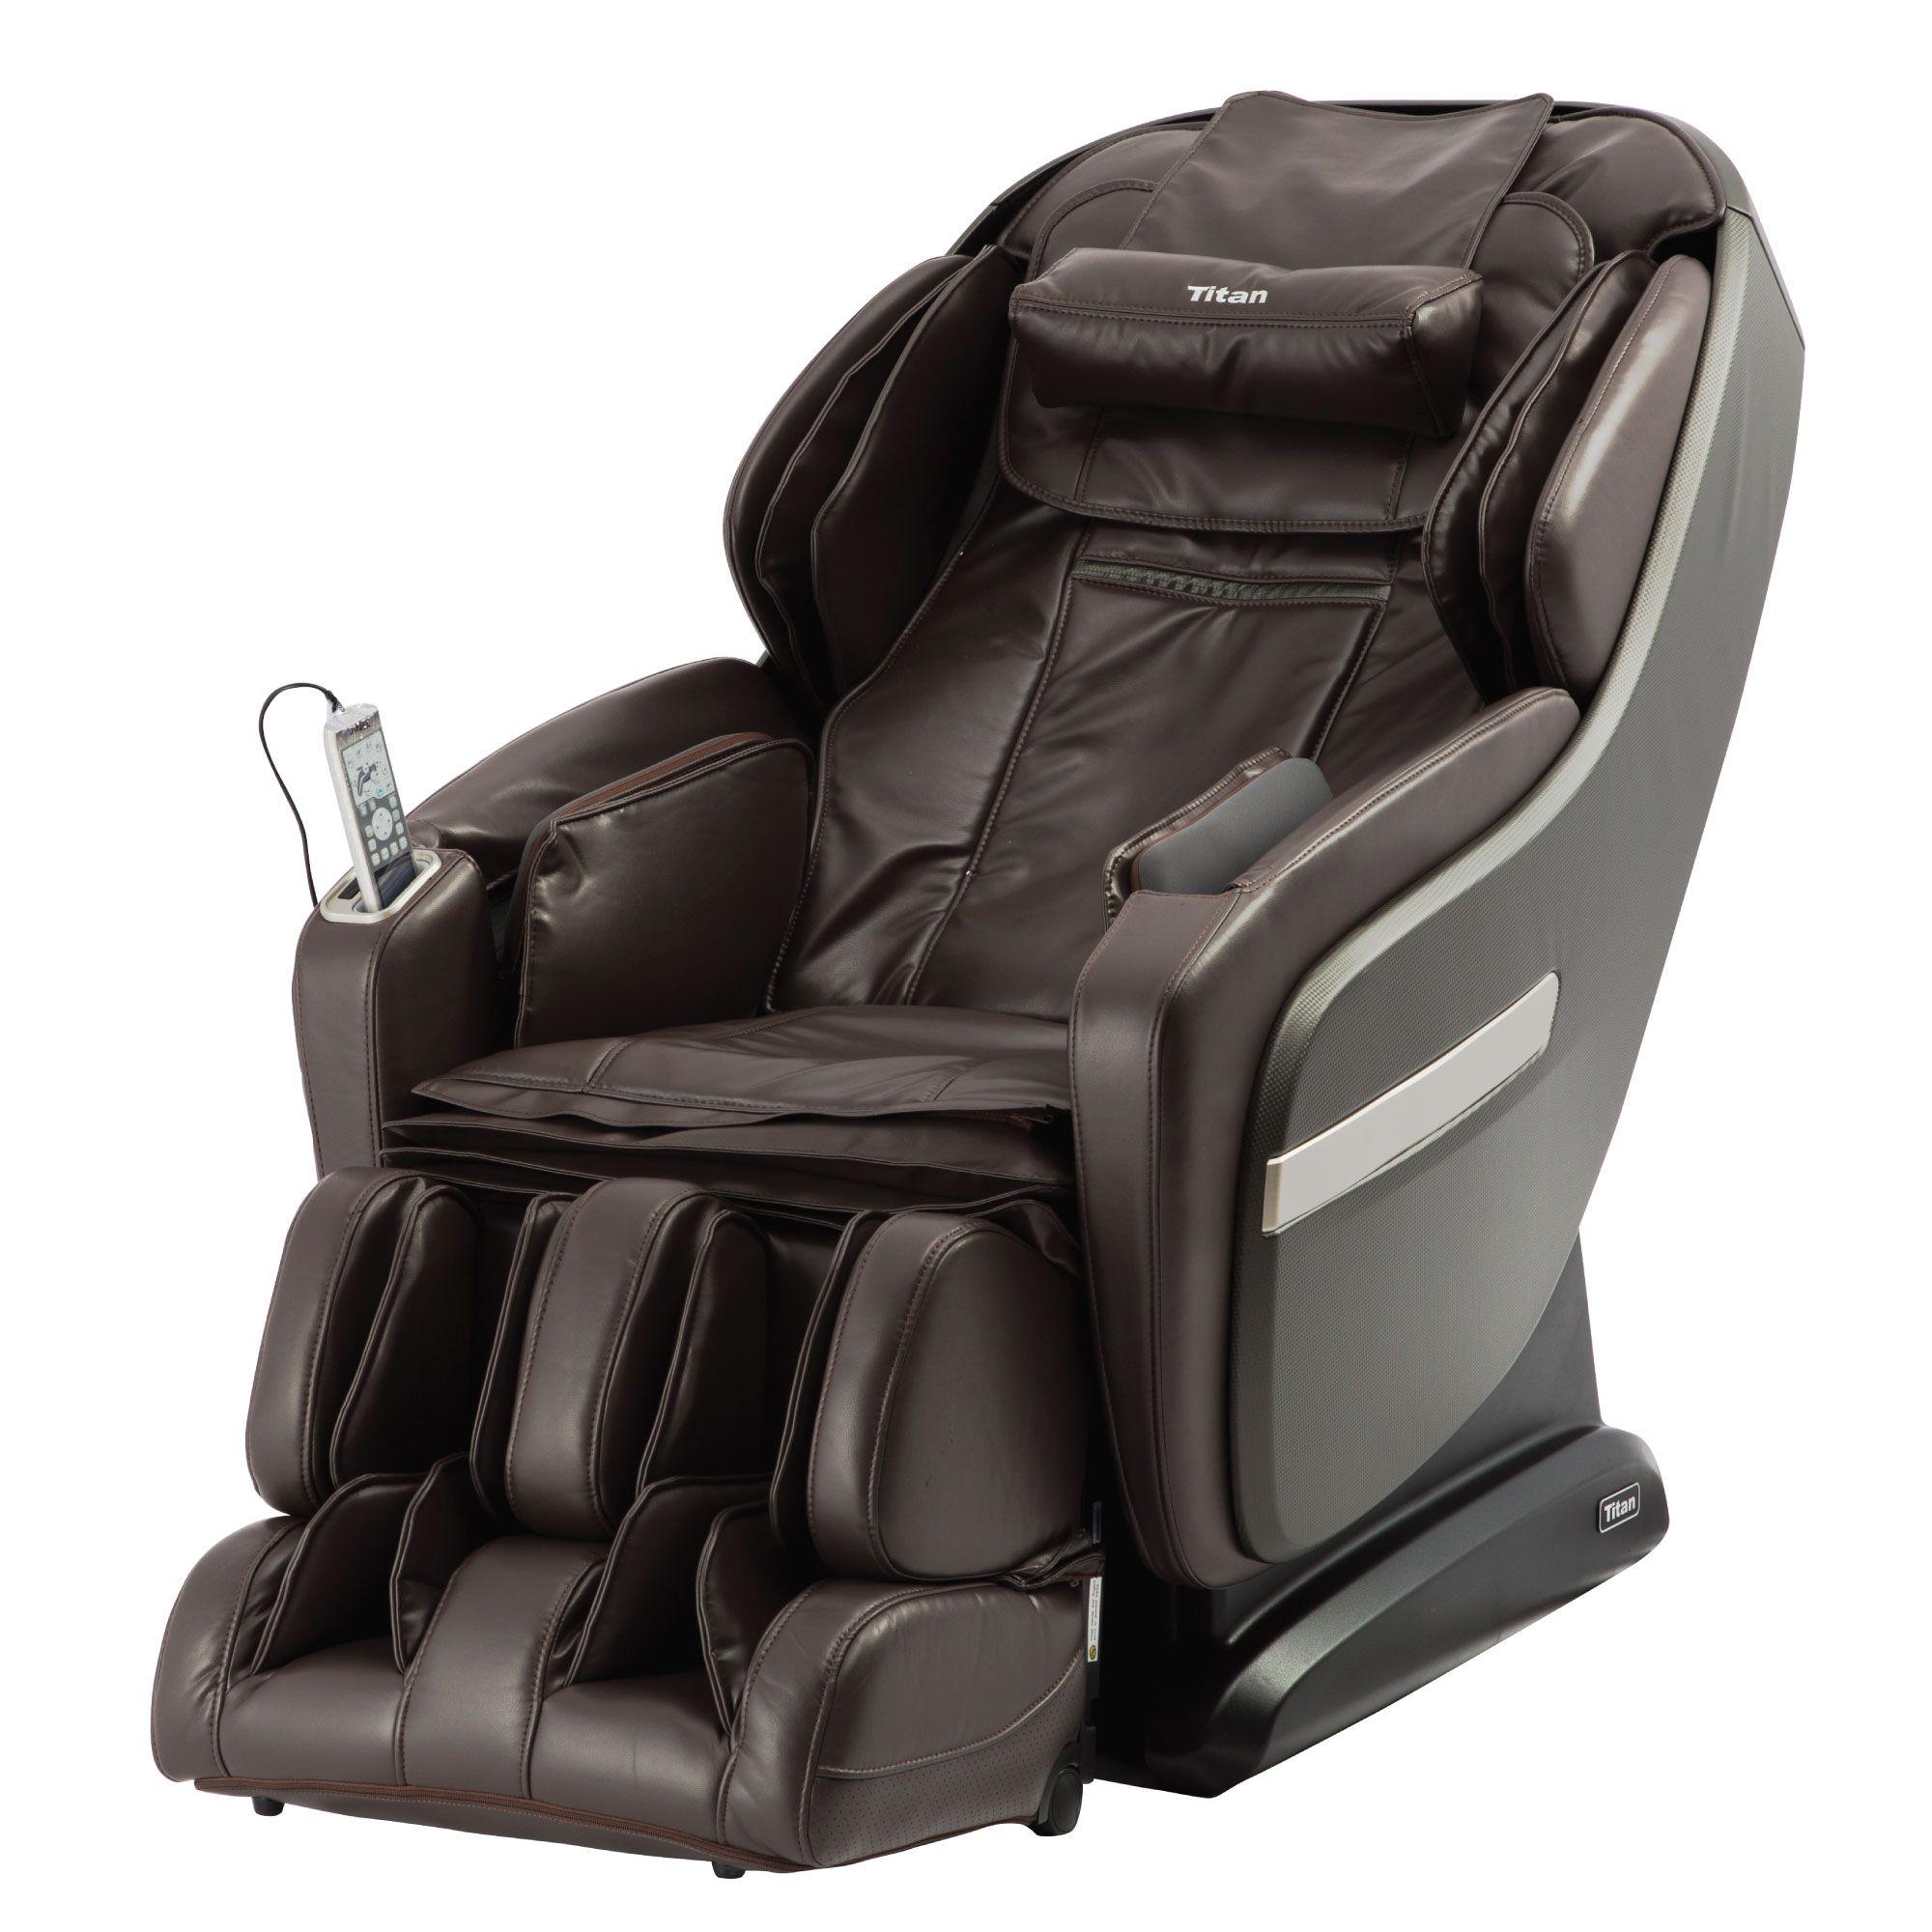 TP Pro Summit Zero Gravity Titan Massage Chair Massage